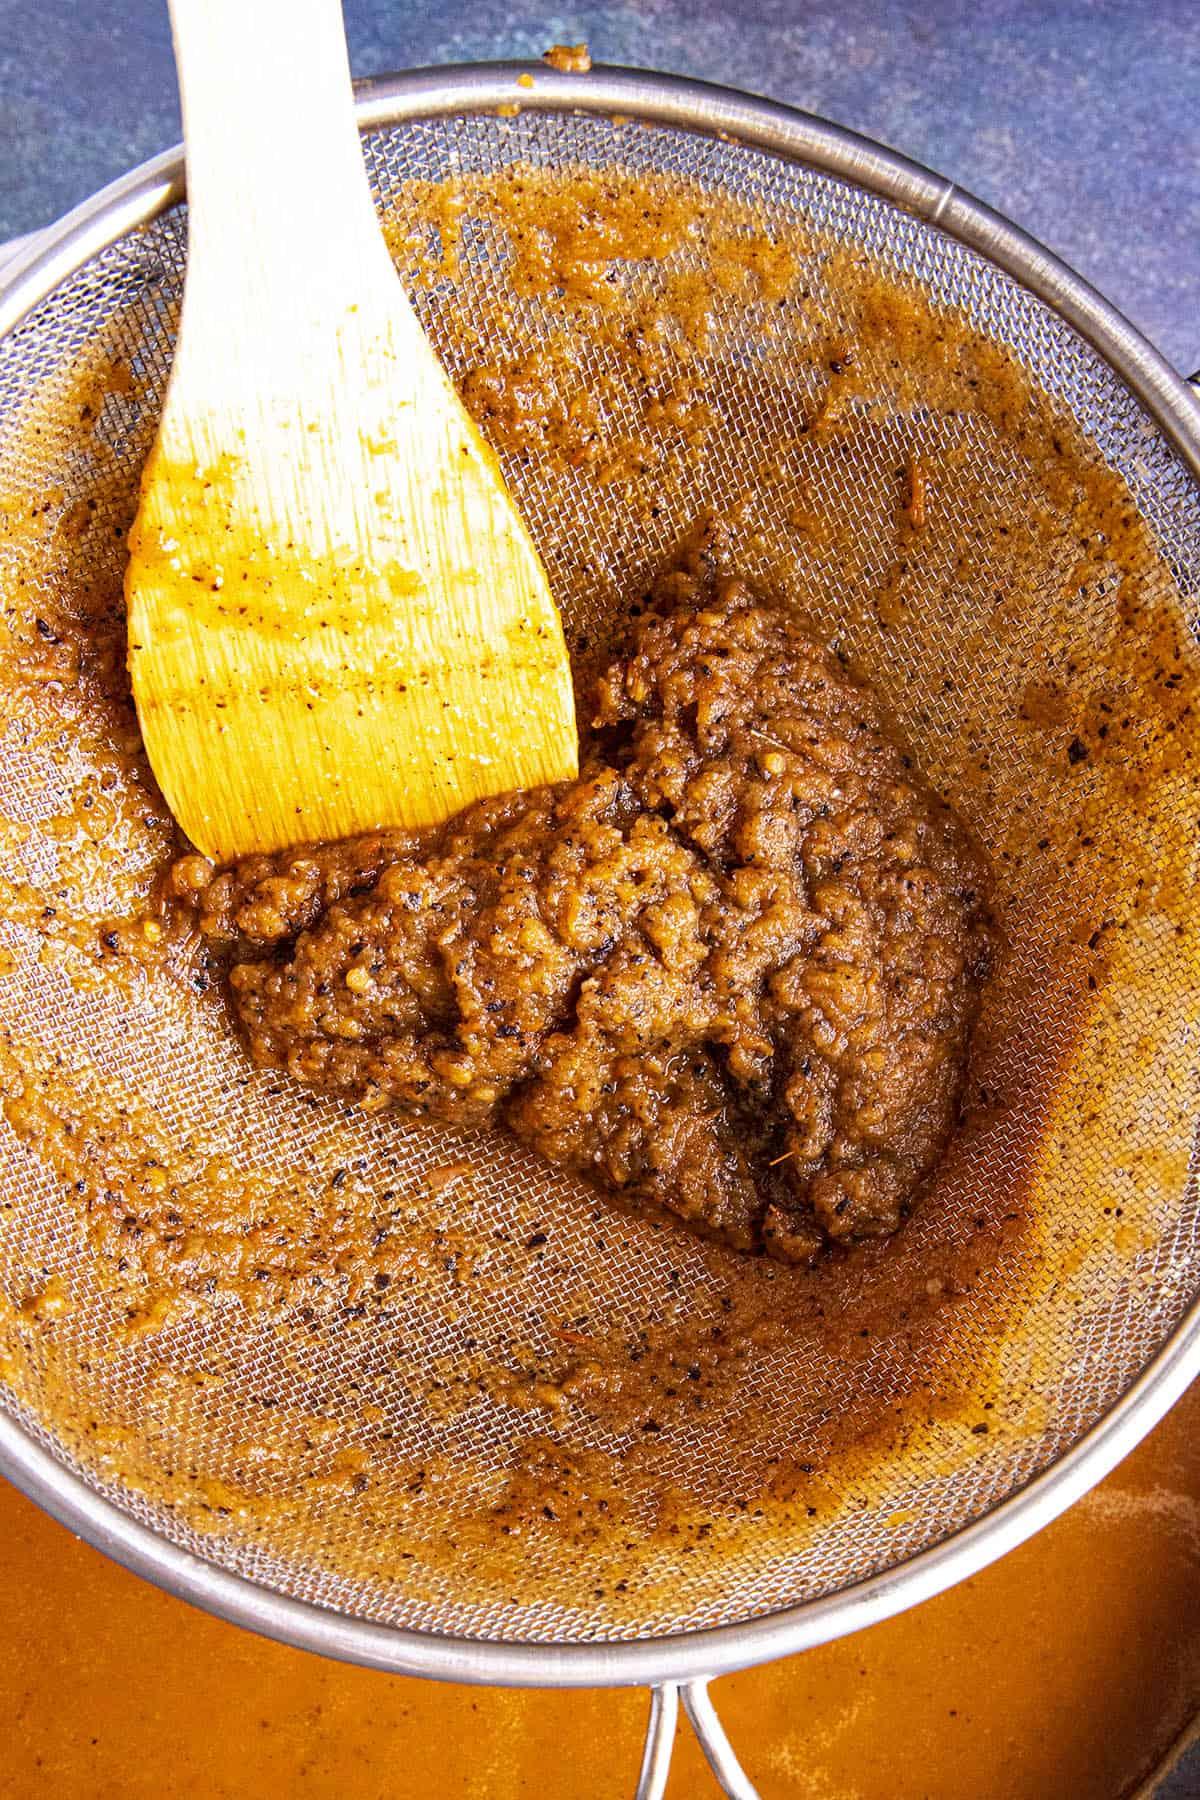 Straining the cooked ingredients to make Tonkatsu Sauce